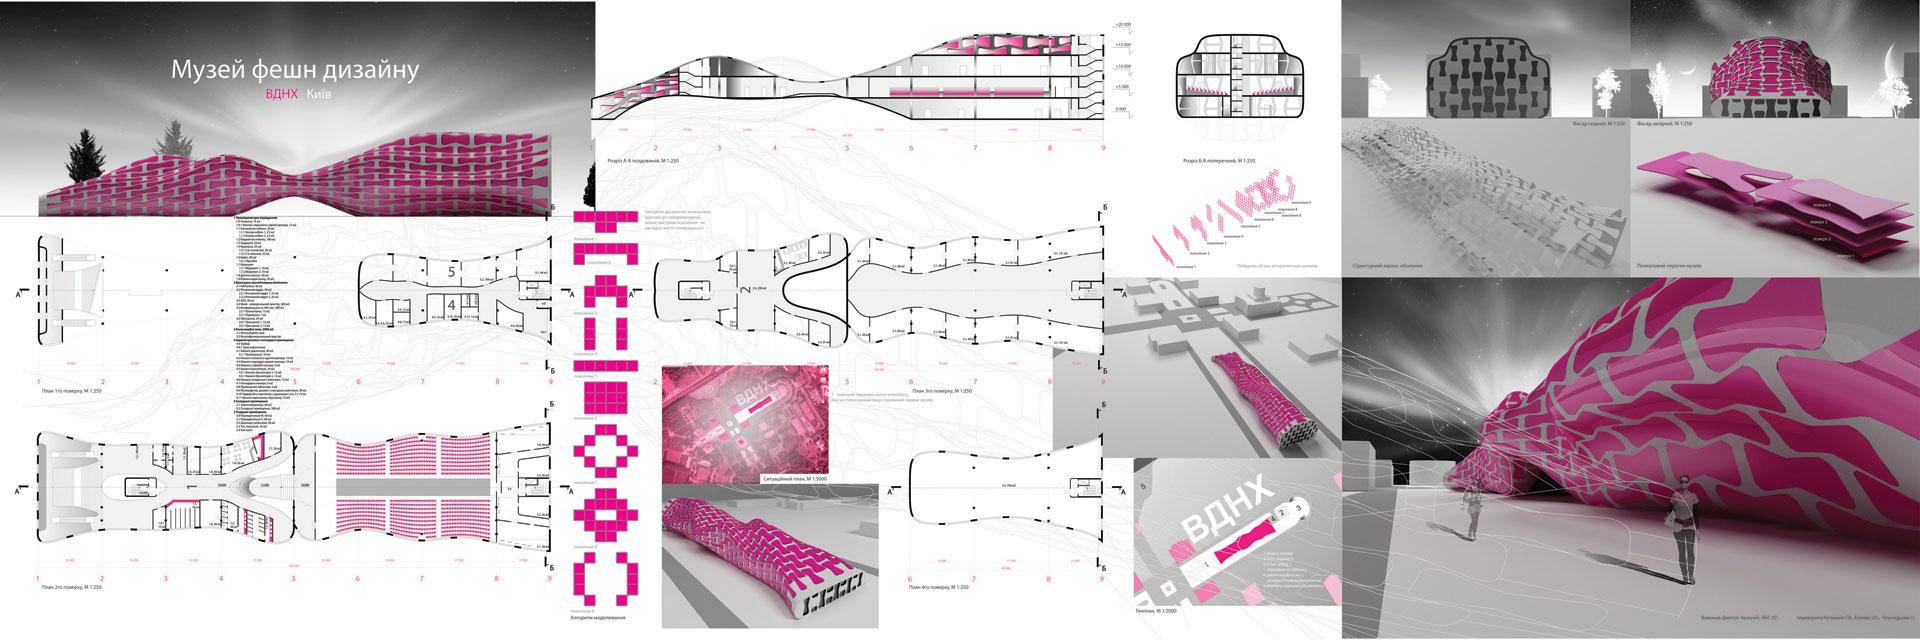 архітектурний планшет параметричного музею дизайну одягу